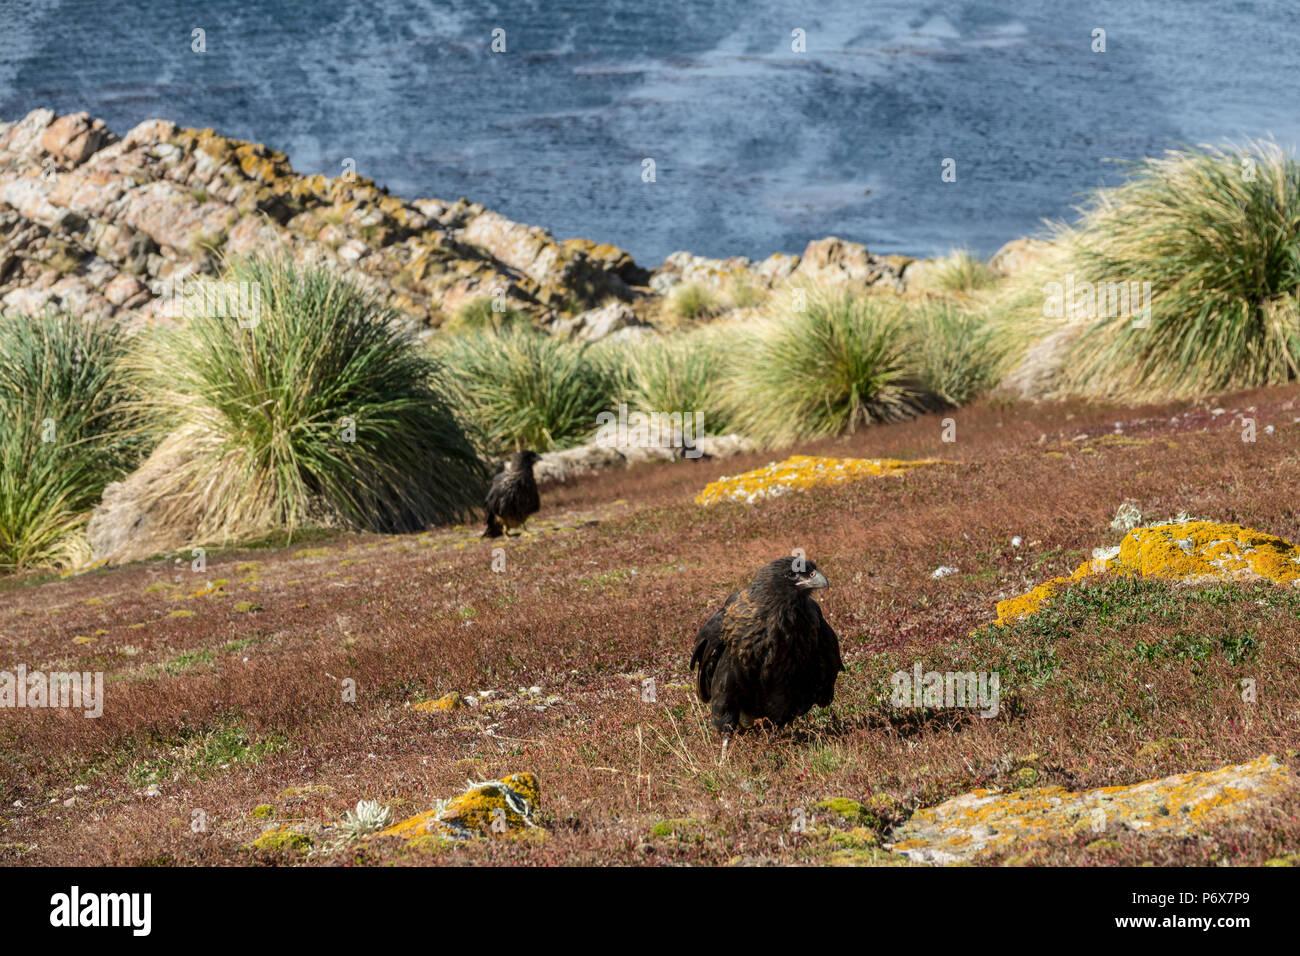 Striated caracaras, Falkland Islands Stock Photo